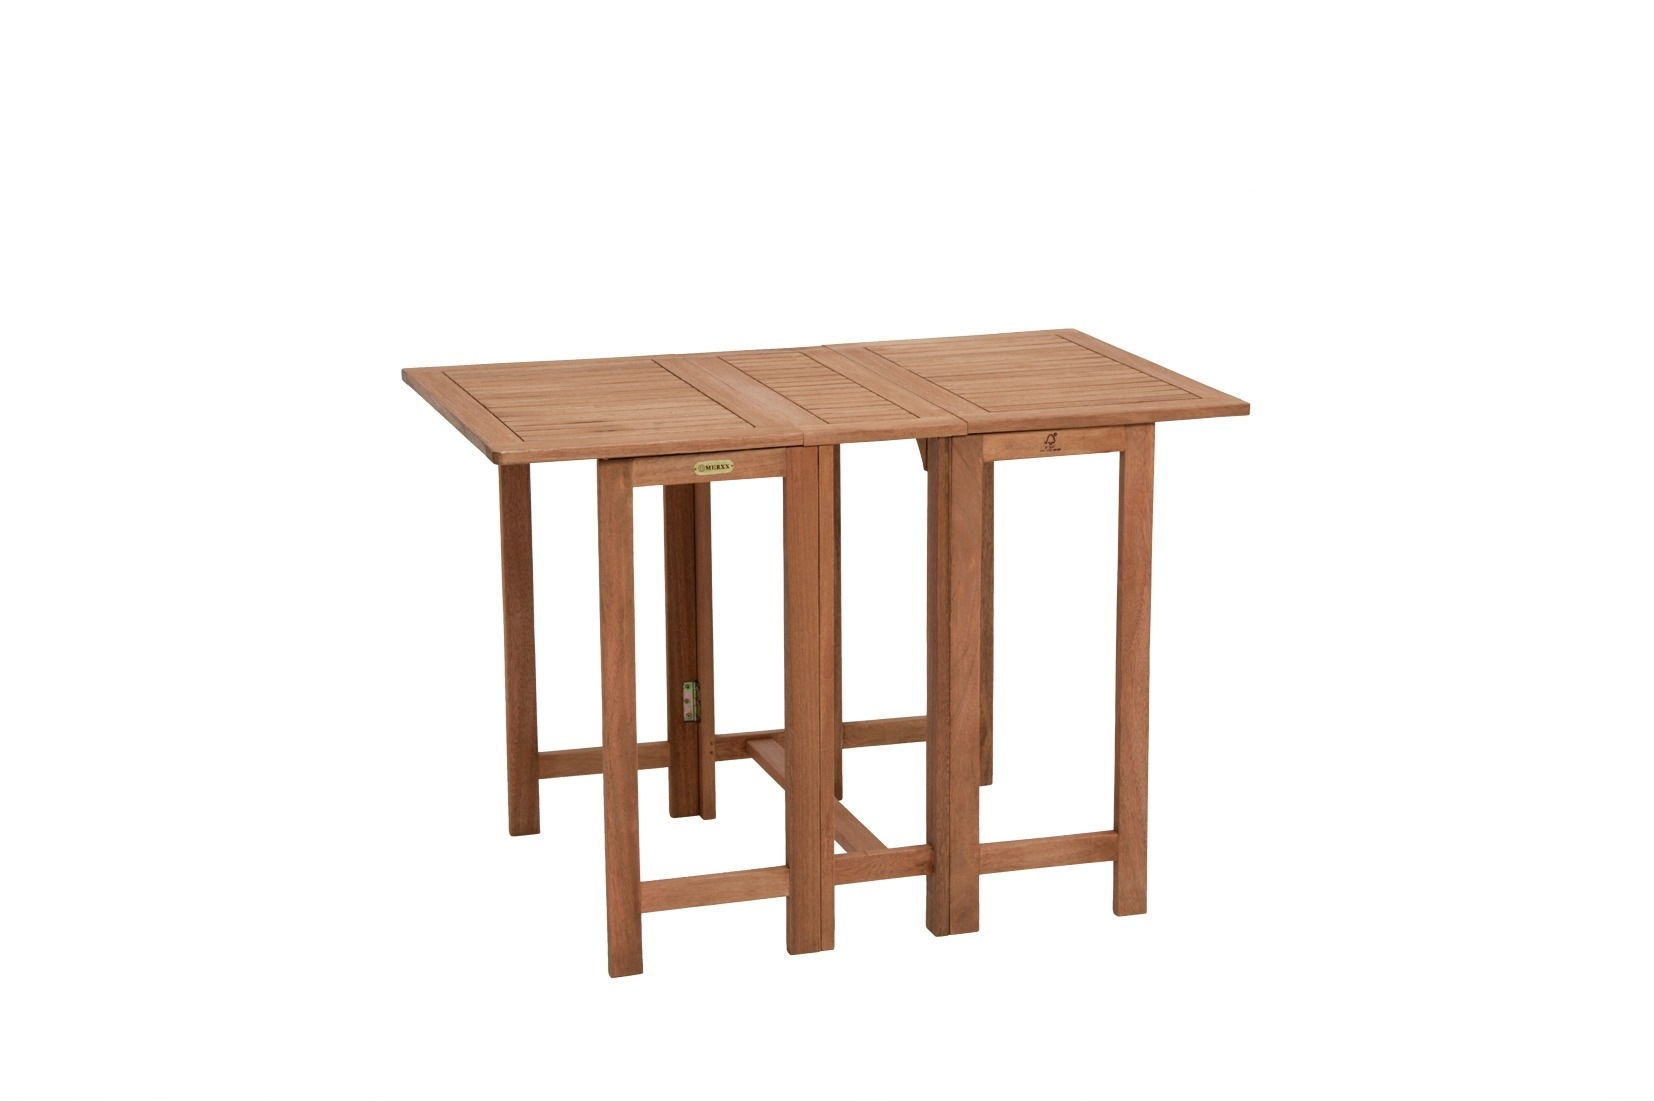 merxx gartentisch holz eukalyptusholz klappbar 107x65. Black Bedroom Furniture Sets. Home Design Ideas